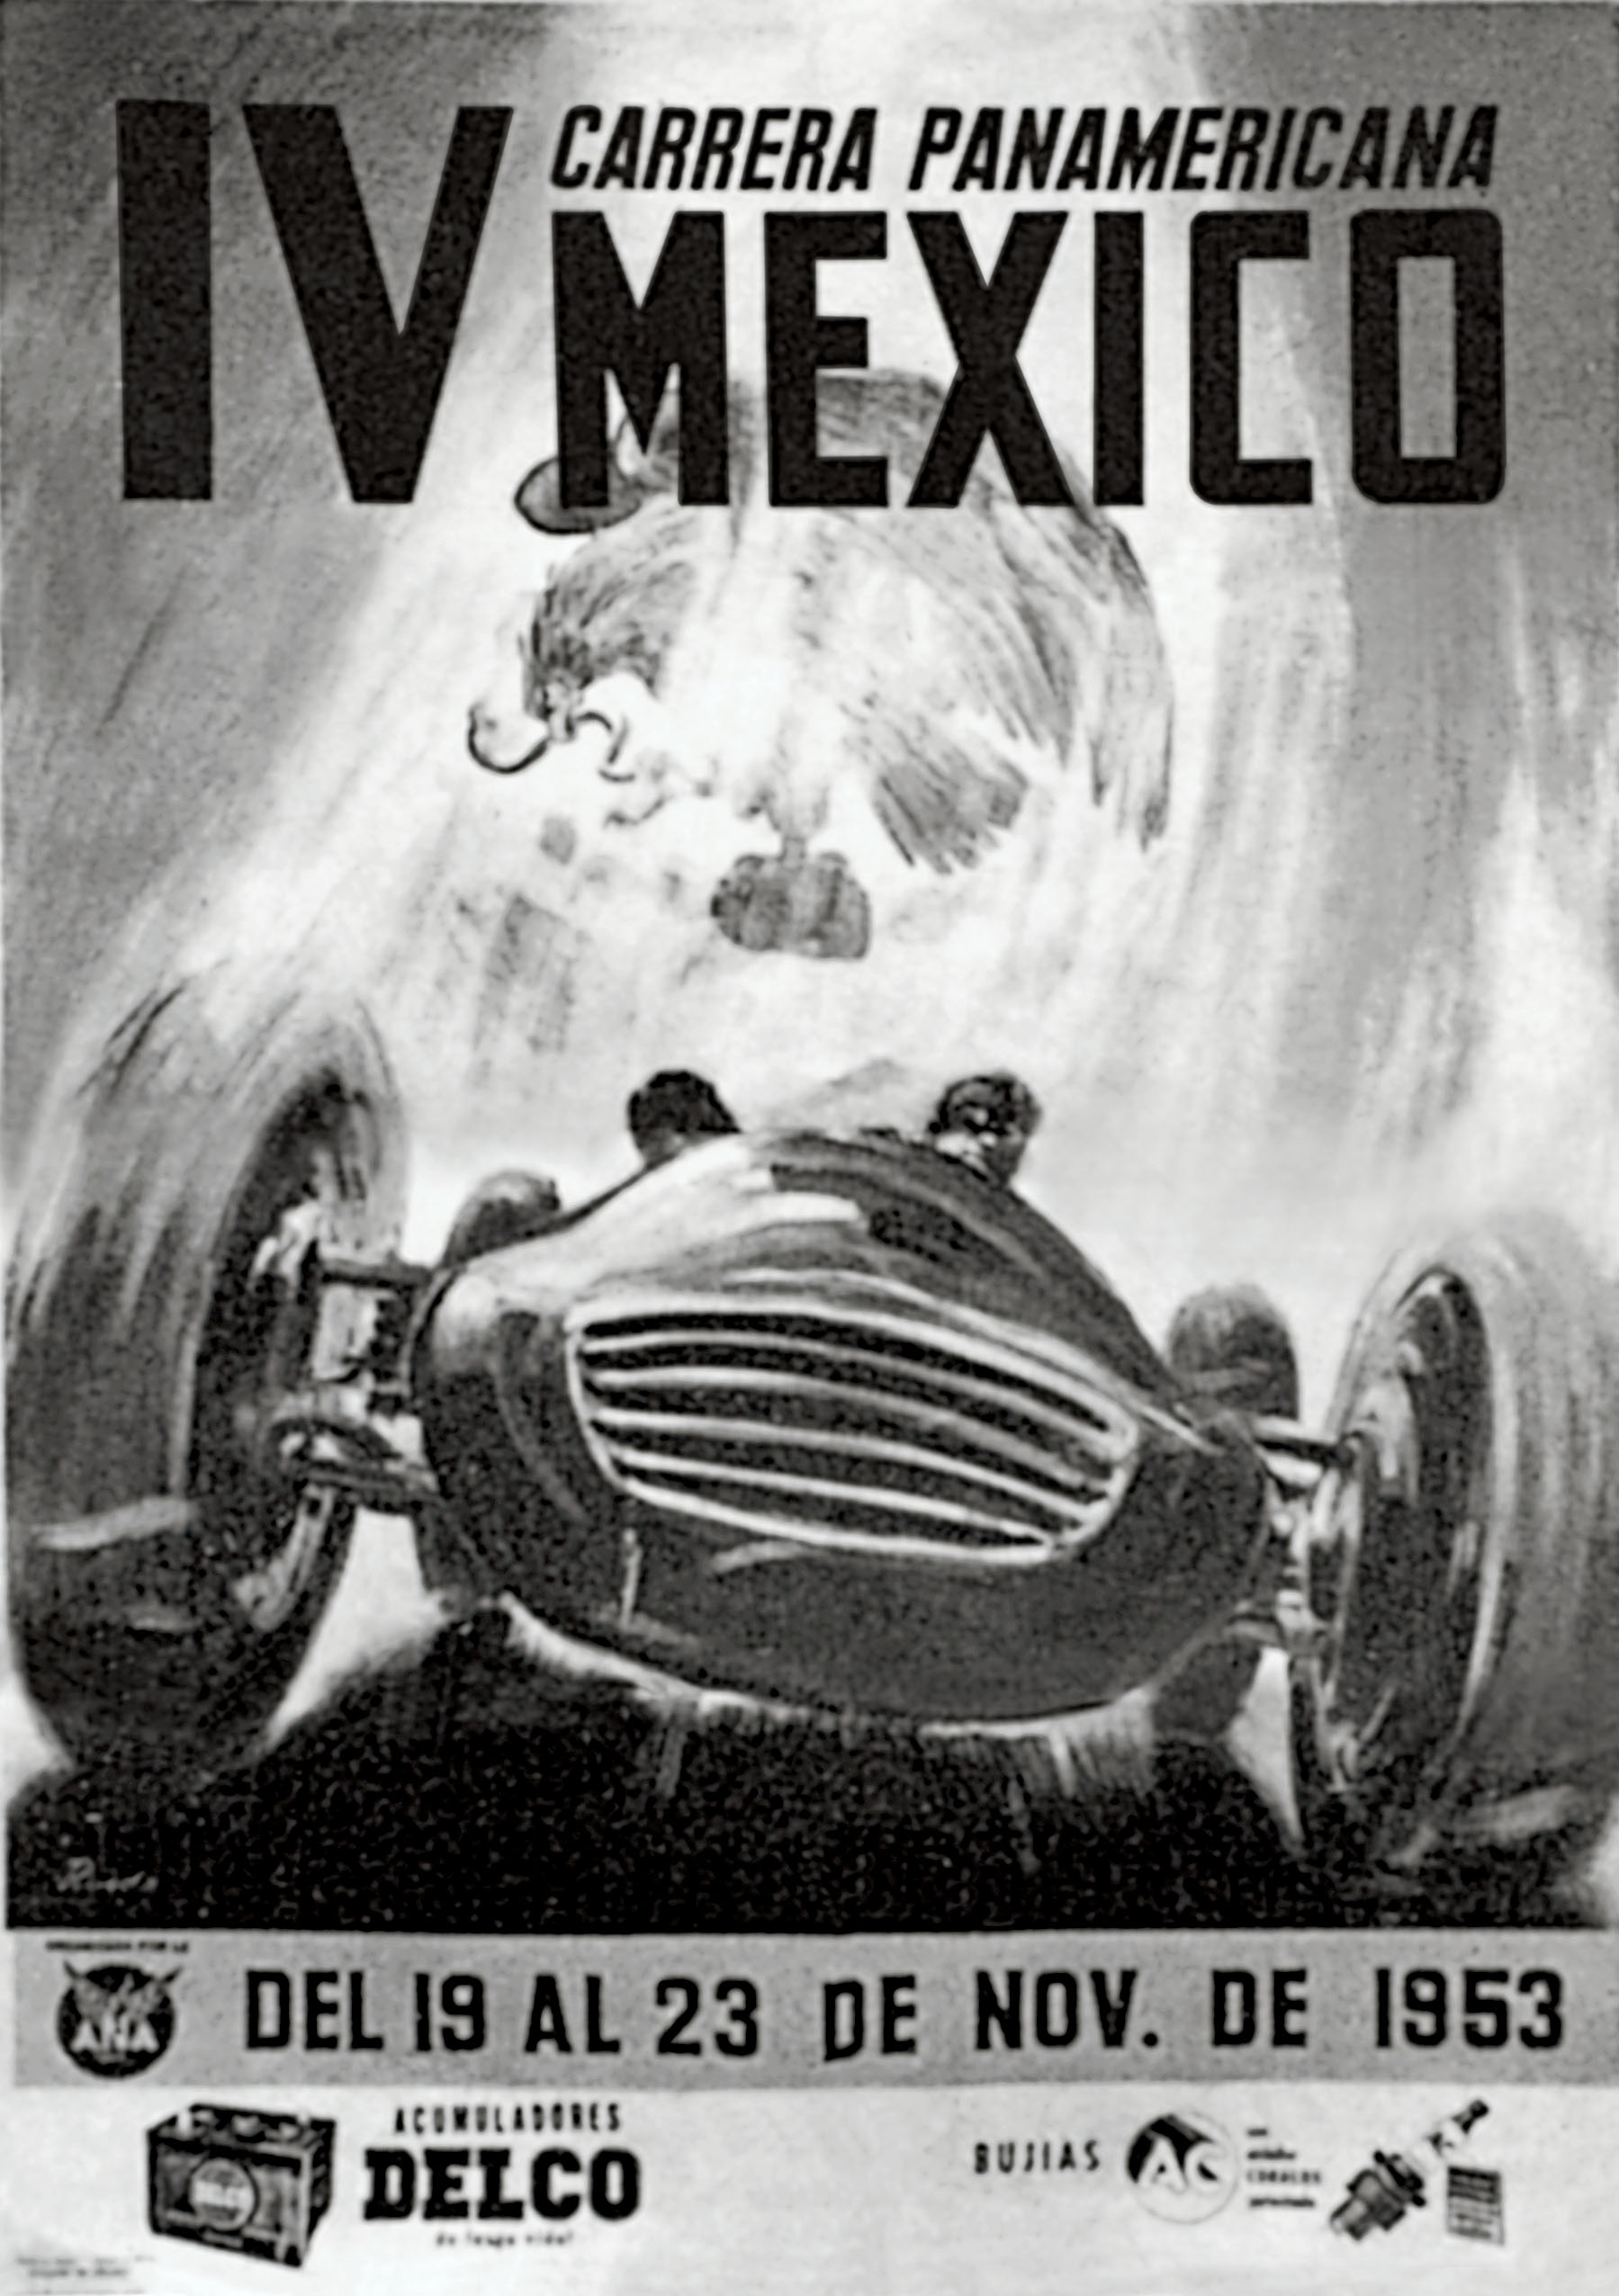 Carrera_Panamerciana_poster_1953.jpg